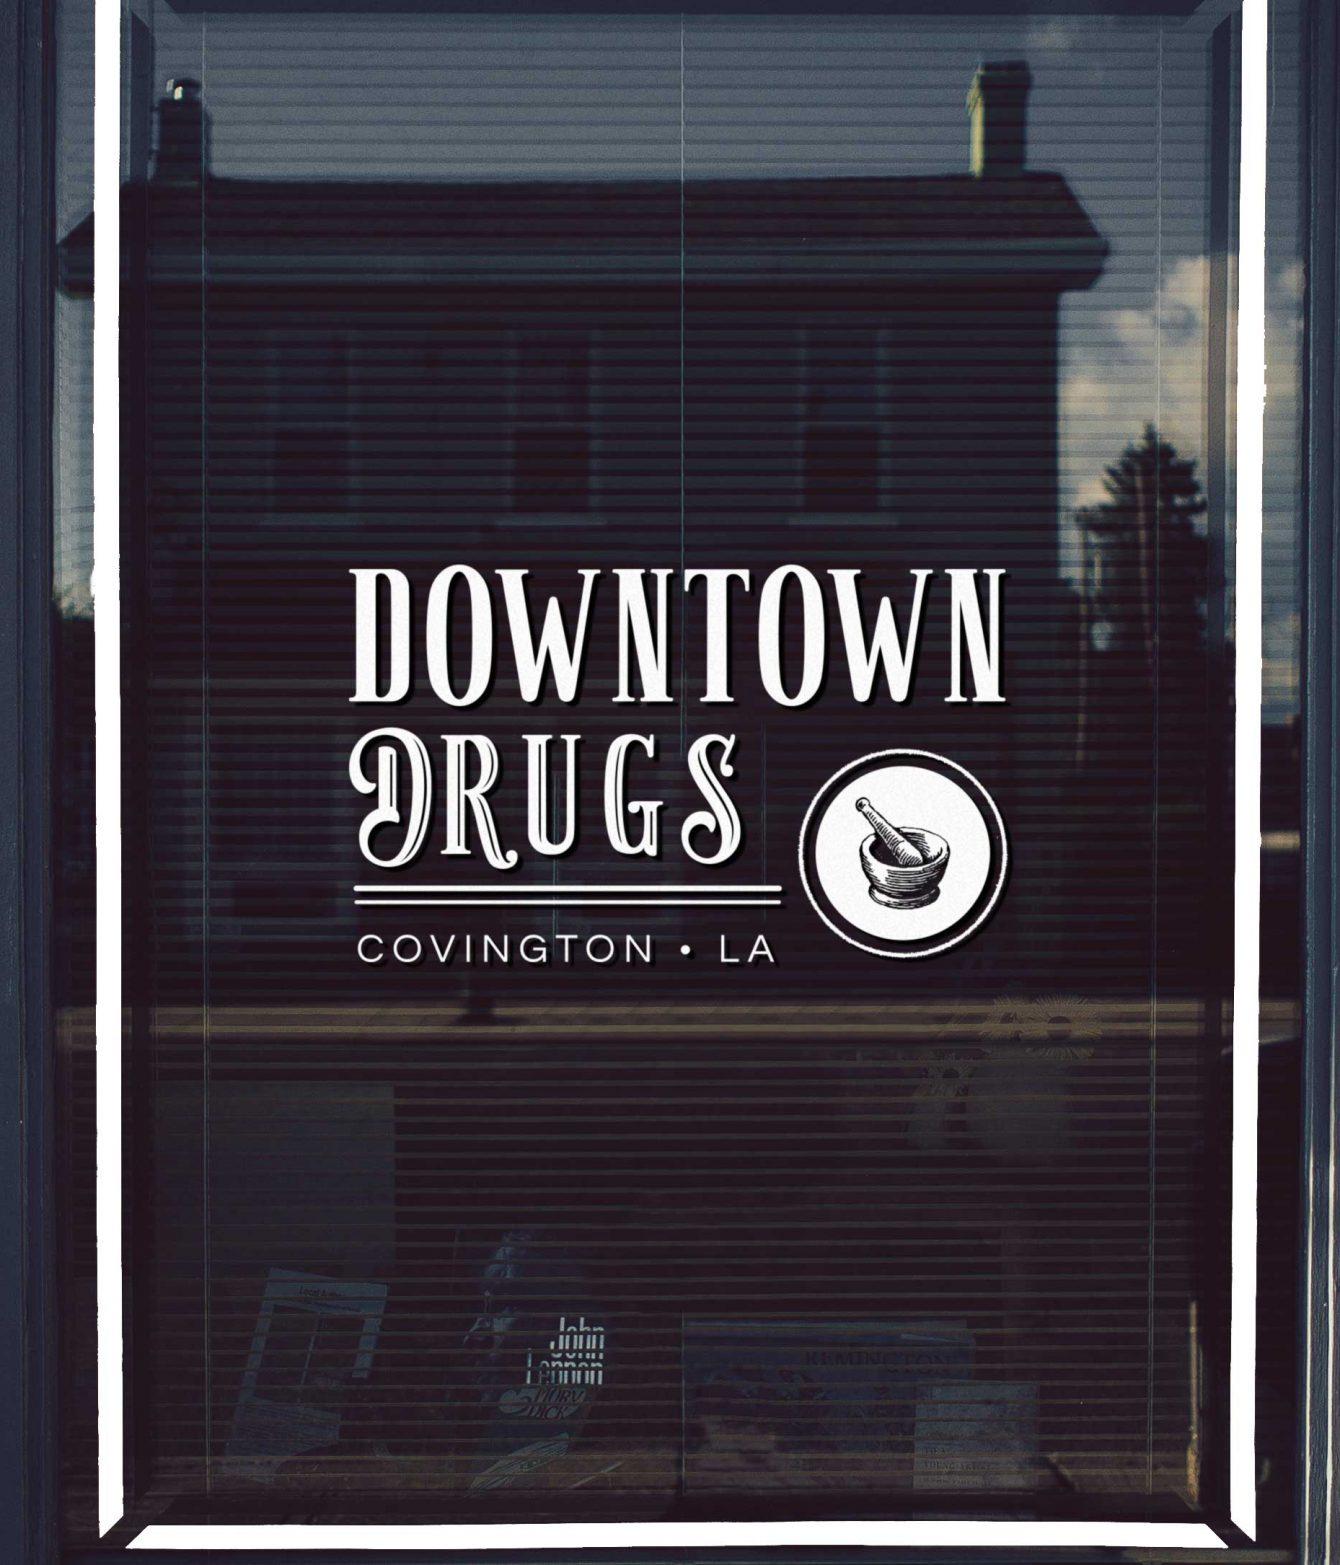 downtown-drugs-window